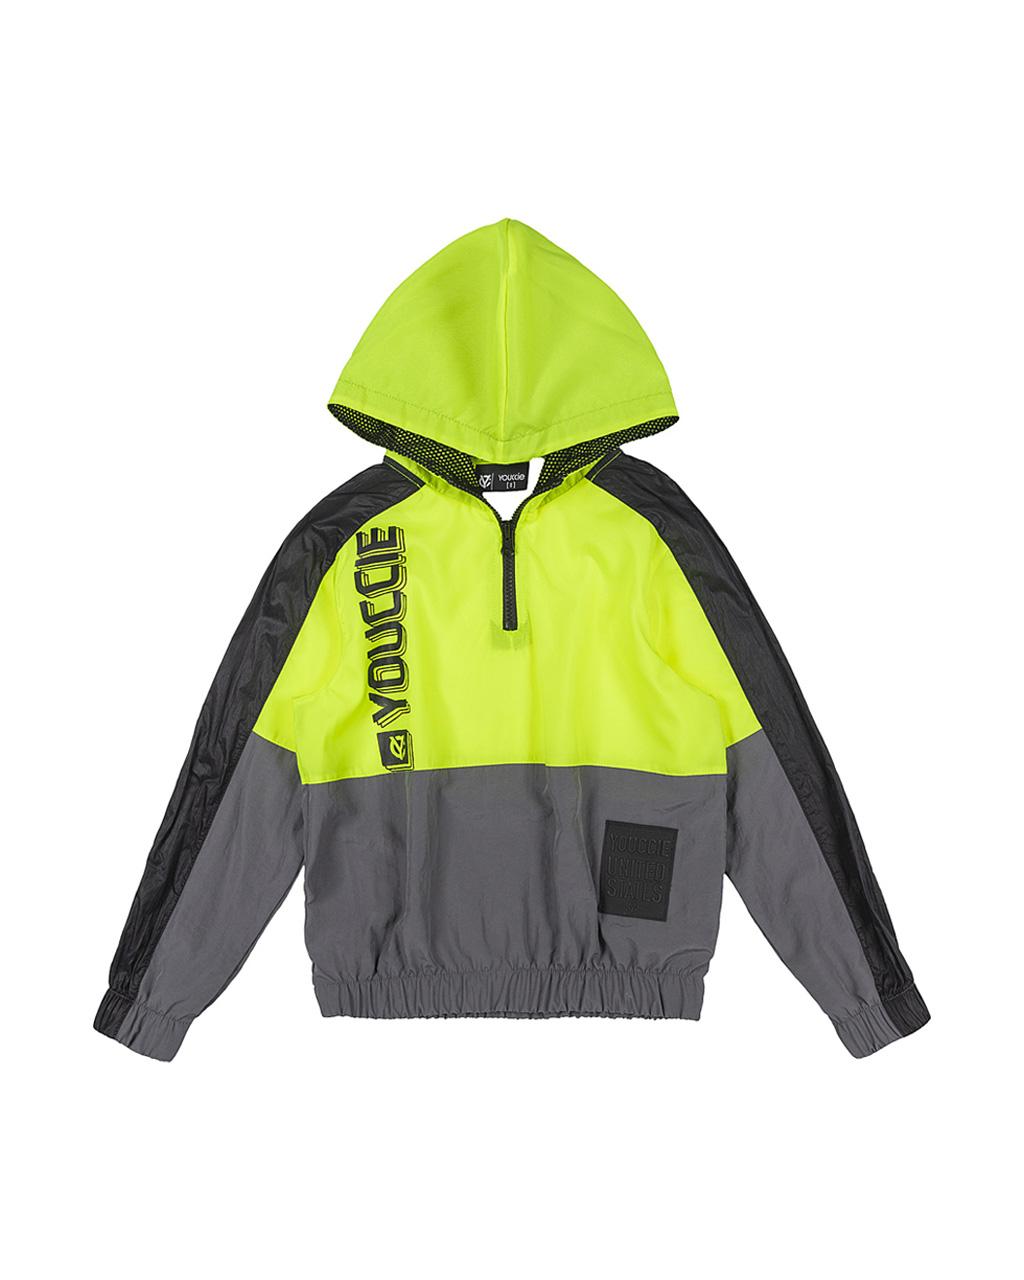 Jaqueta Infantil Corta Vento Com Capuz Amarelo Neon Youccie